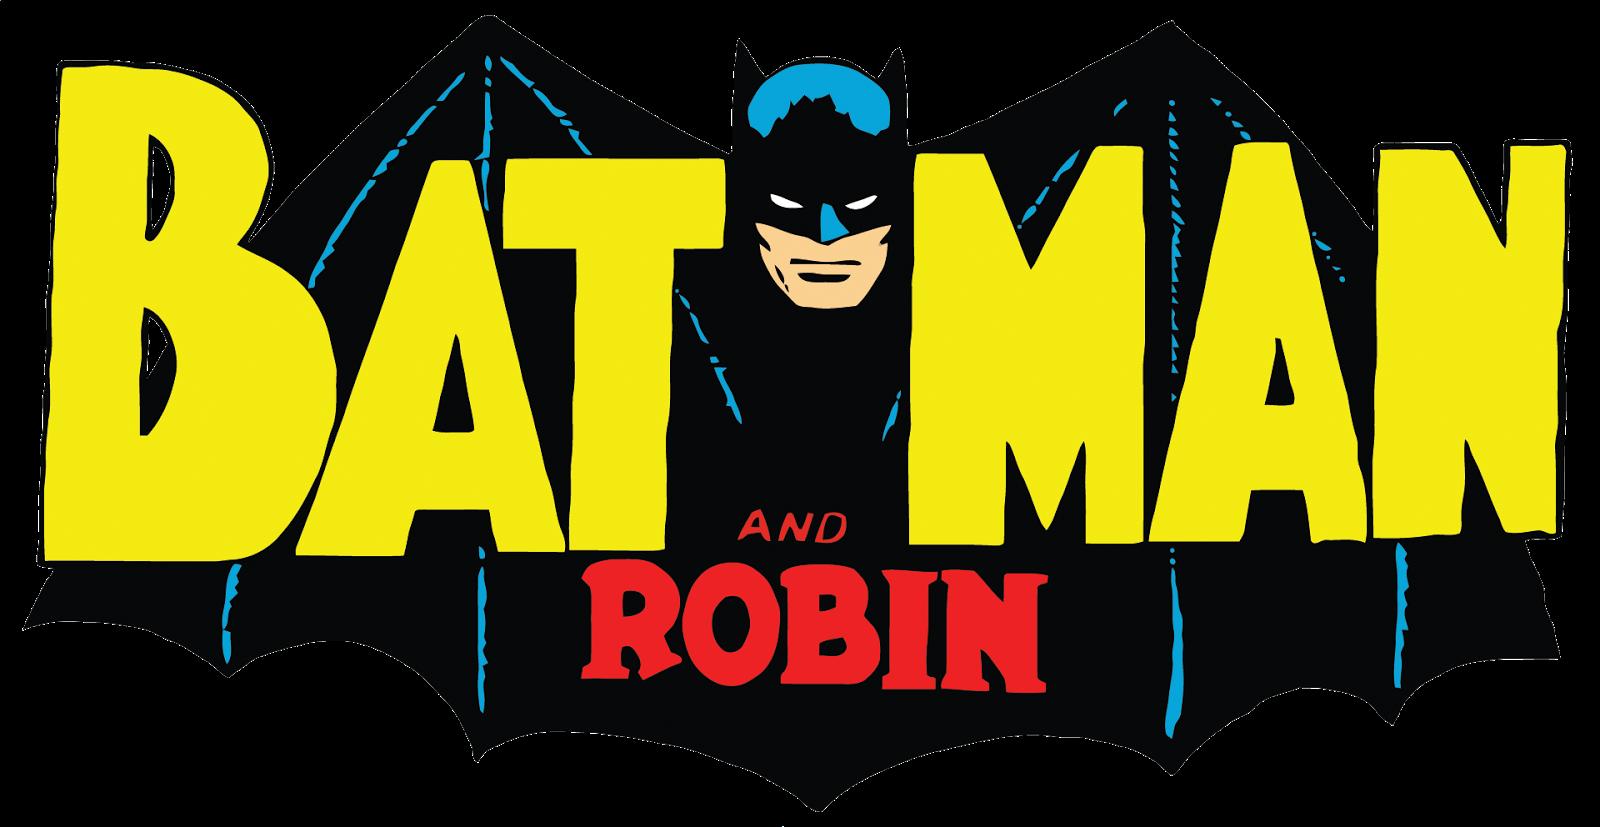 Pin By Olsen Ross On Bat Symbol Batman Batman And Batgirl Batman Film